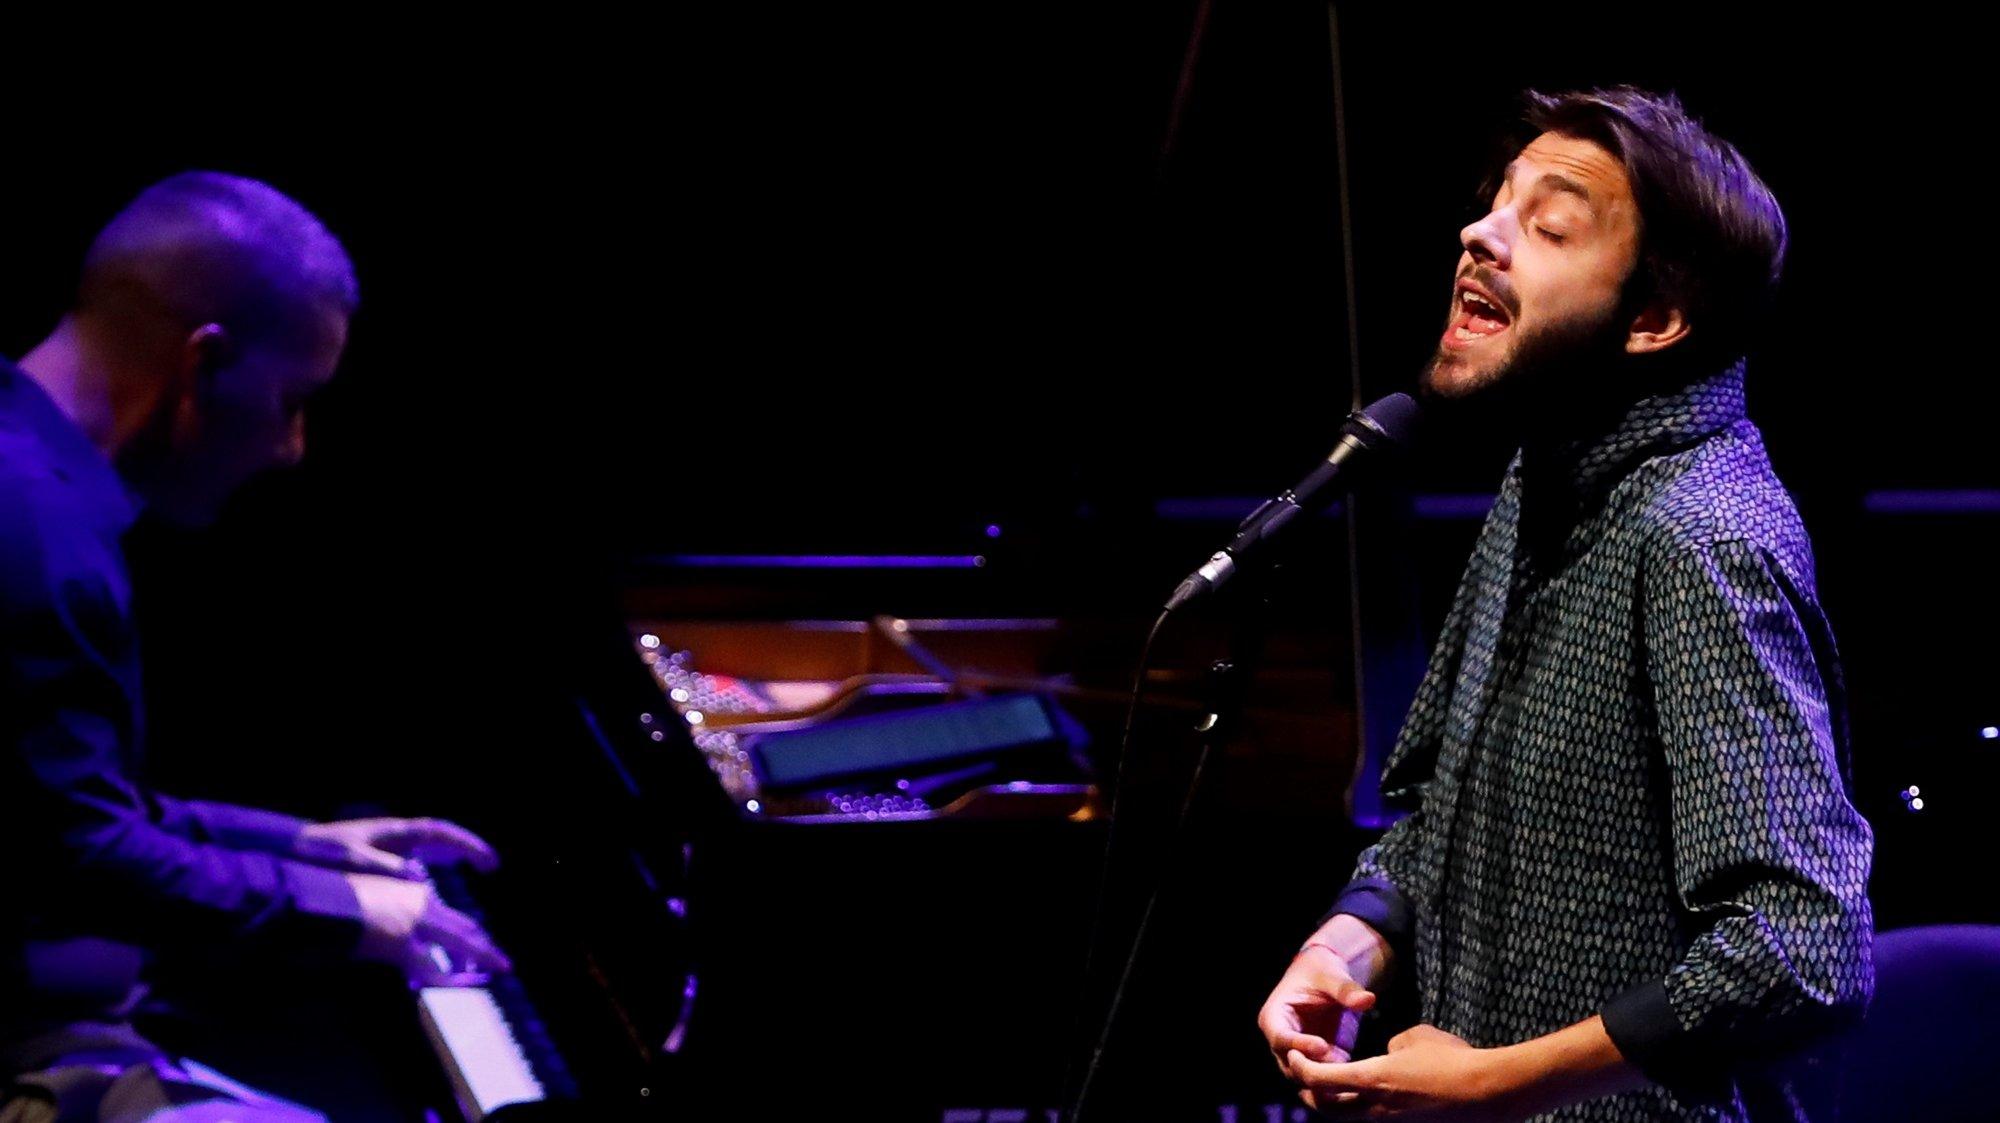 Portuguese singer Salvador Sobral performs at Kursaal auditorium within the San Sebasian Jazz Festival held in San Sebastian, Spain, 24 July 2020. EPA/Javier Etxezarreta